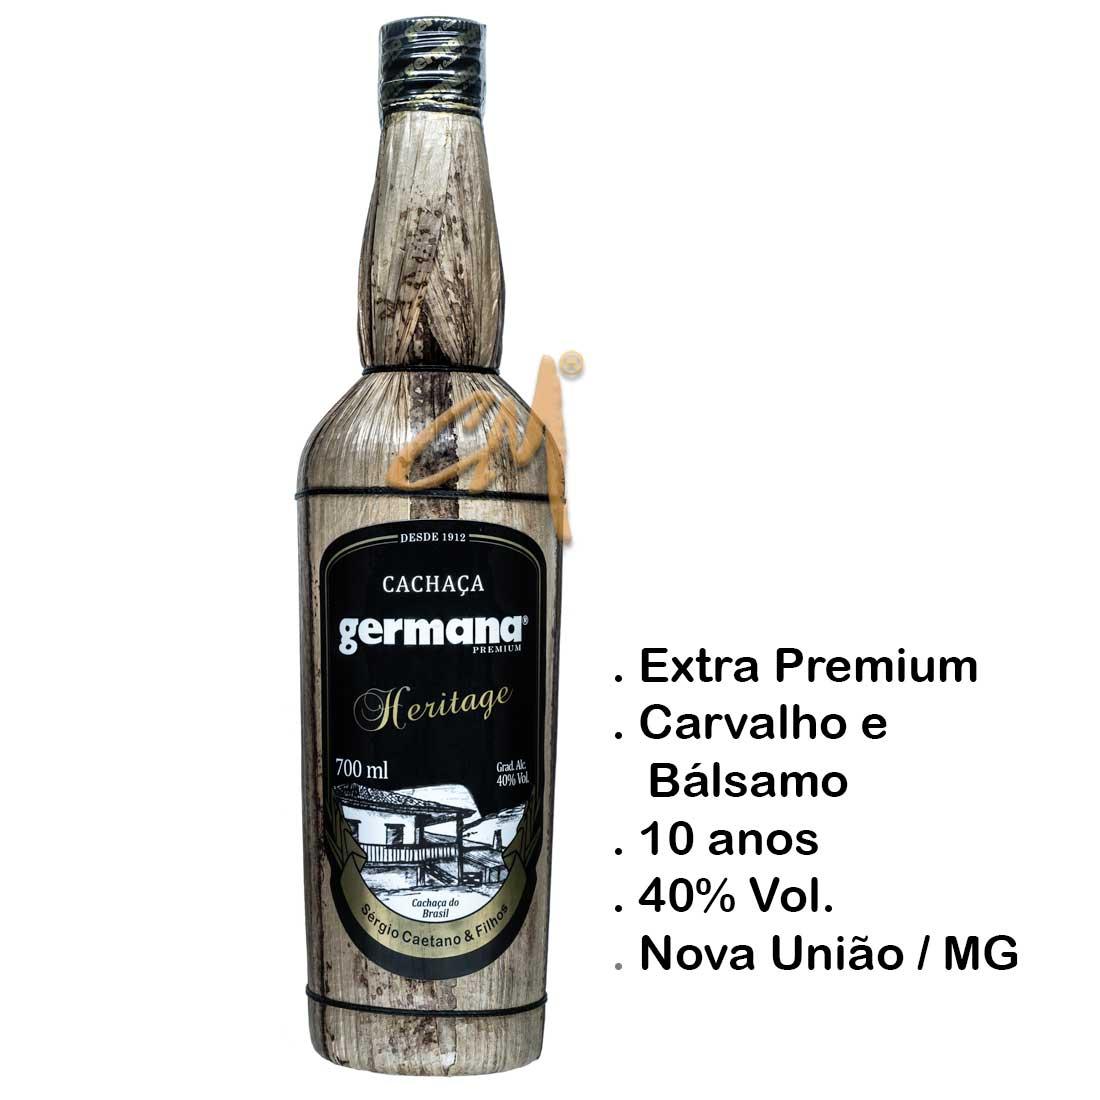 Cachaça Germana Heritage 700 ml (Nova União - MG)